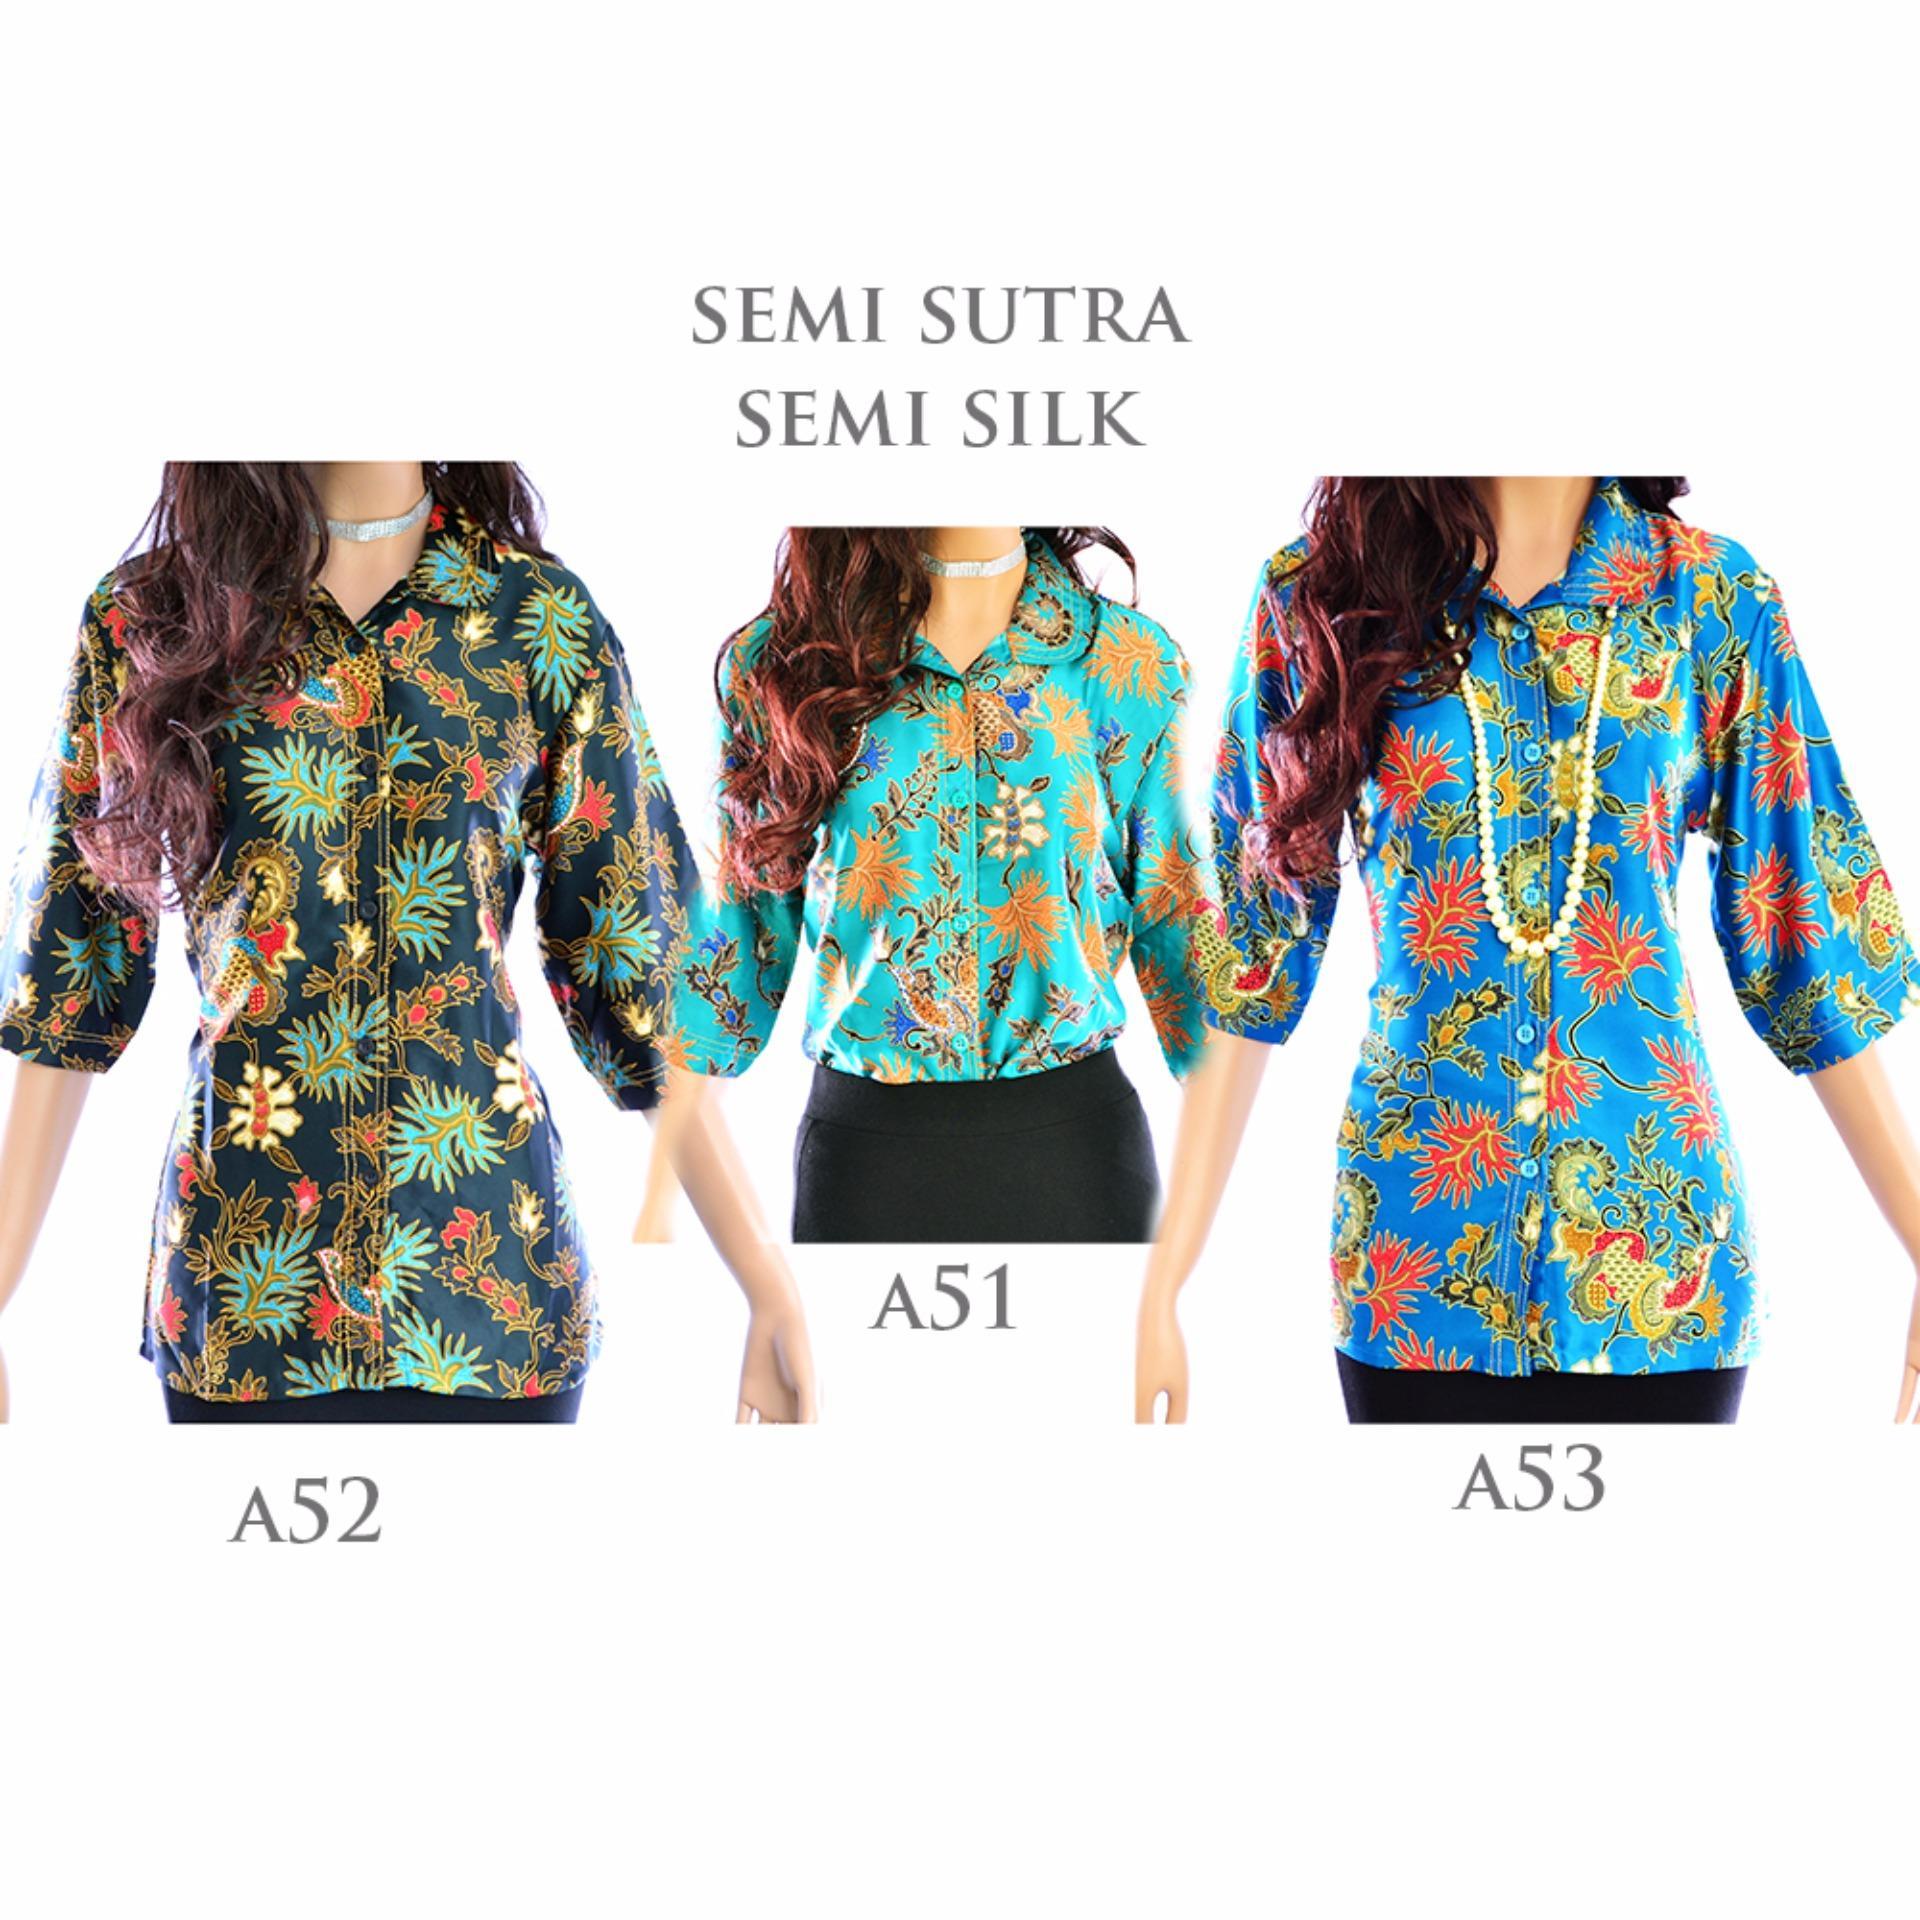 Cj collection Couple batik Atasan blouse kemeja abaya kebaya wanita dan atasan kemeja pria shirt Merryna